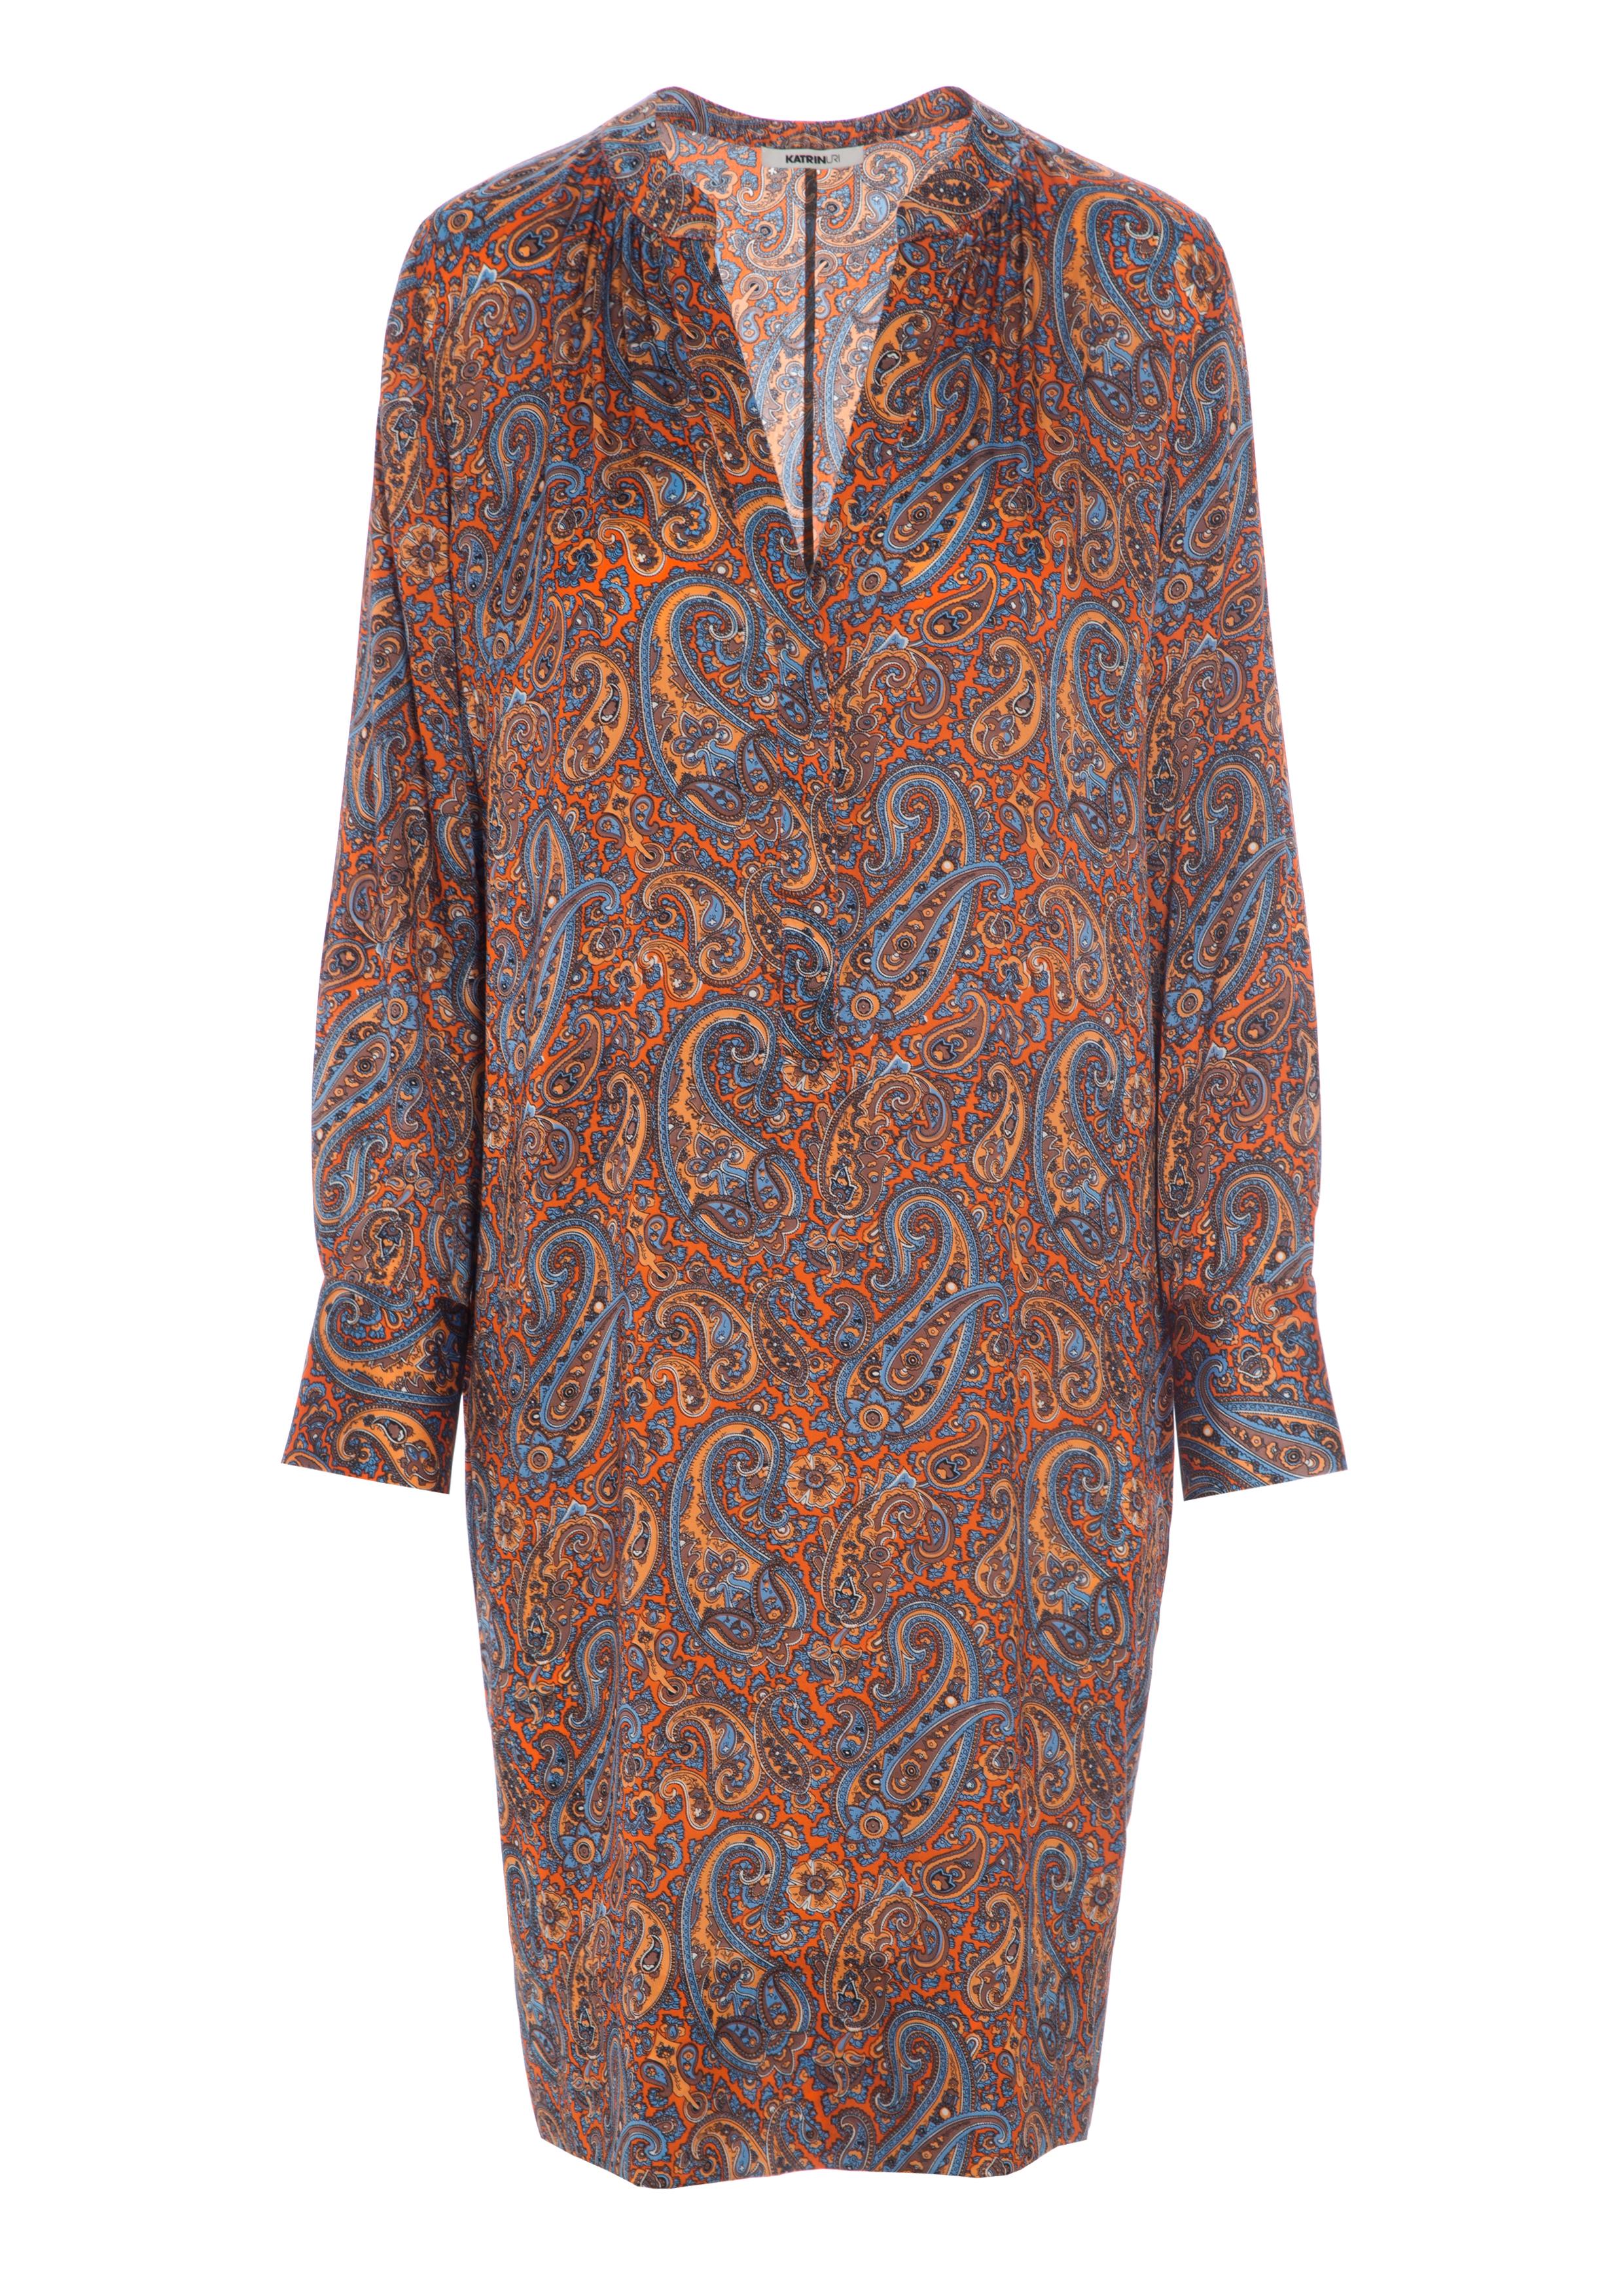 3c4b0804d9a2 KATRIN URI - Paisley Shift Dress - Feel Good Store